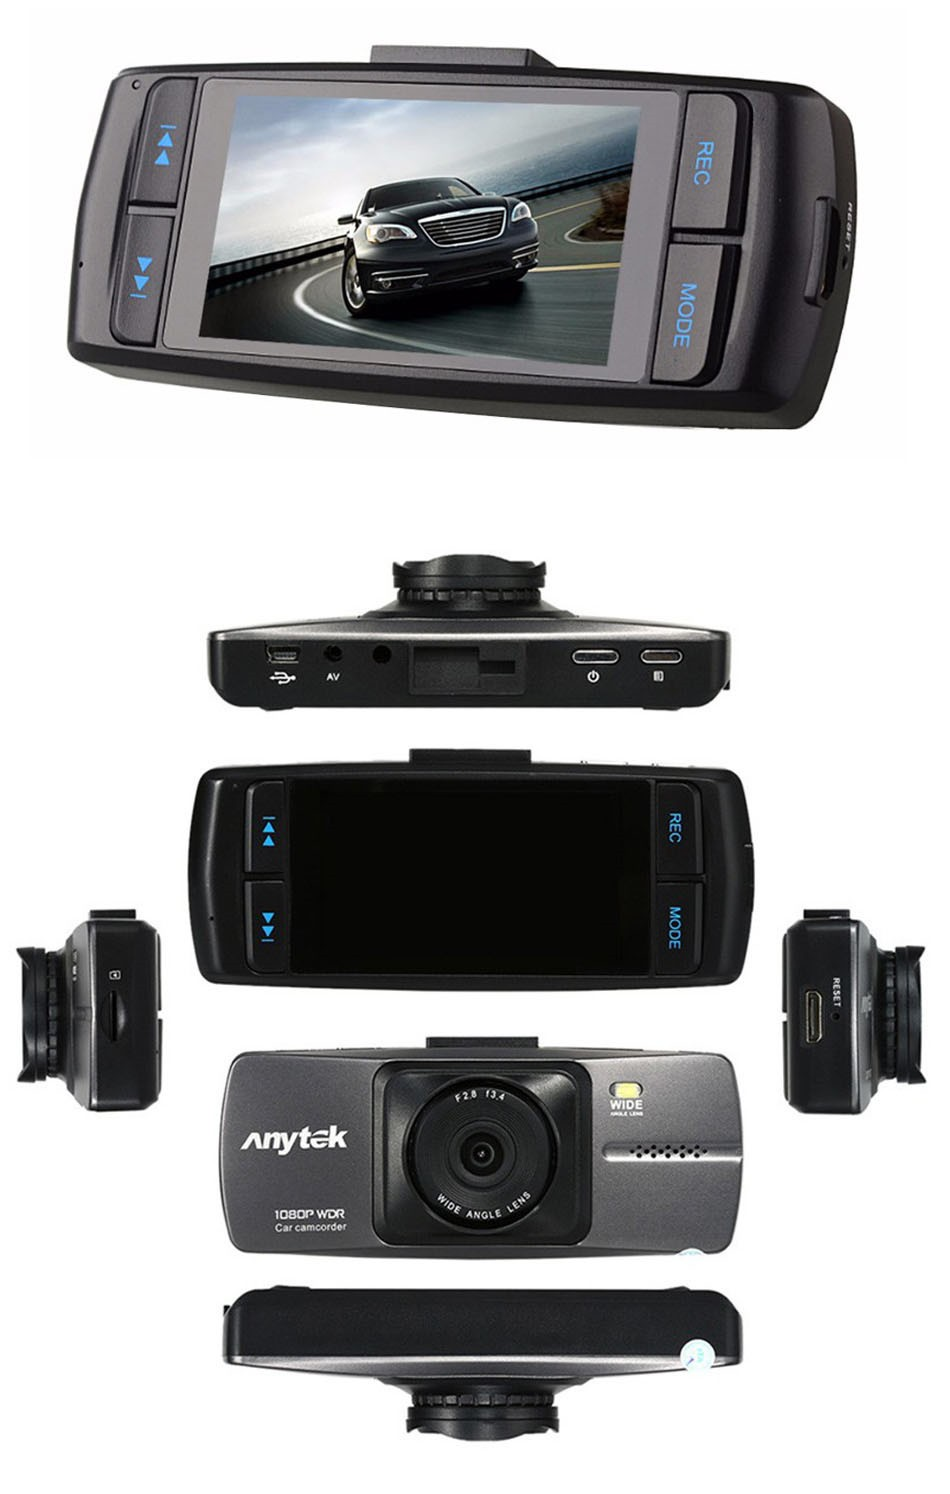 Anytek Dash Cam A88 2.7 Inch DVR Full HD 1080P Car Camera Novatek 96220 Parking Monitor Registrator Video Recorder Night Vision DVRS -06